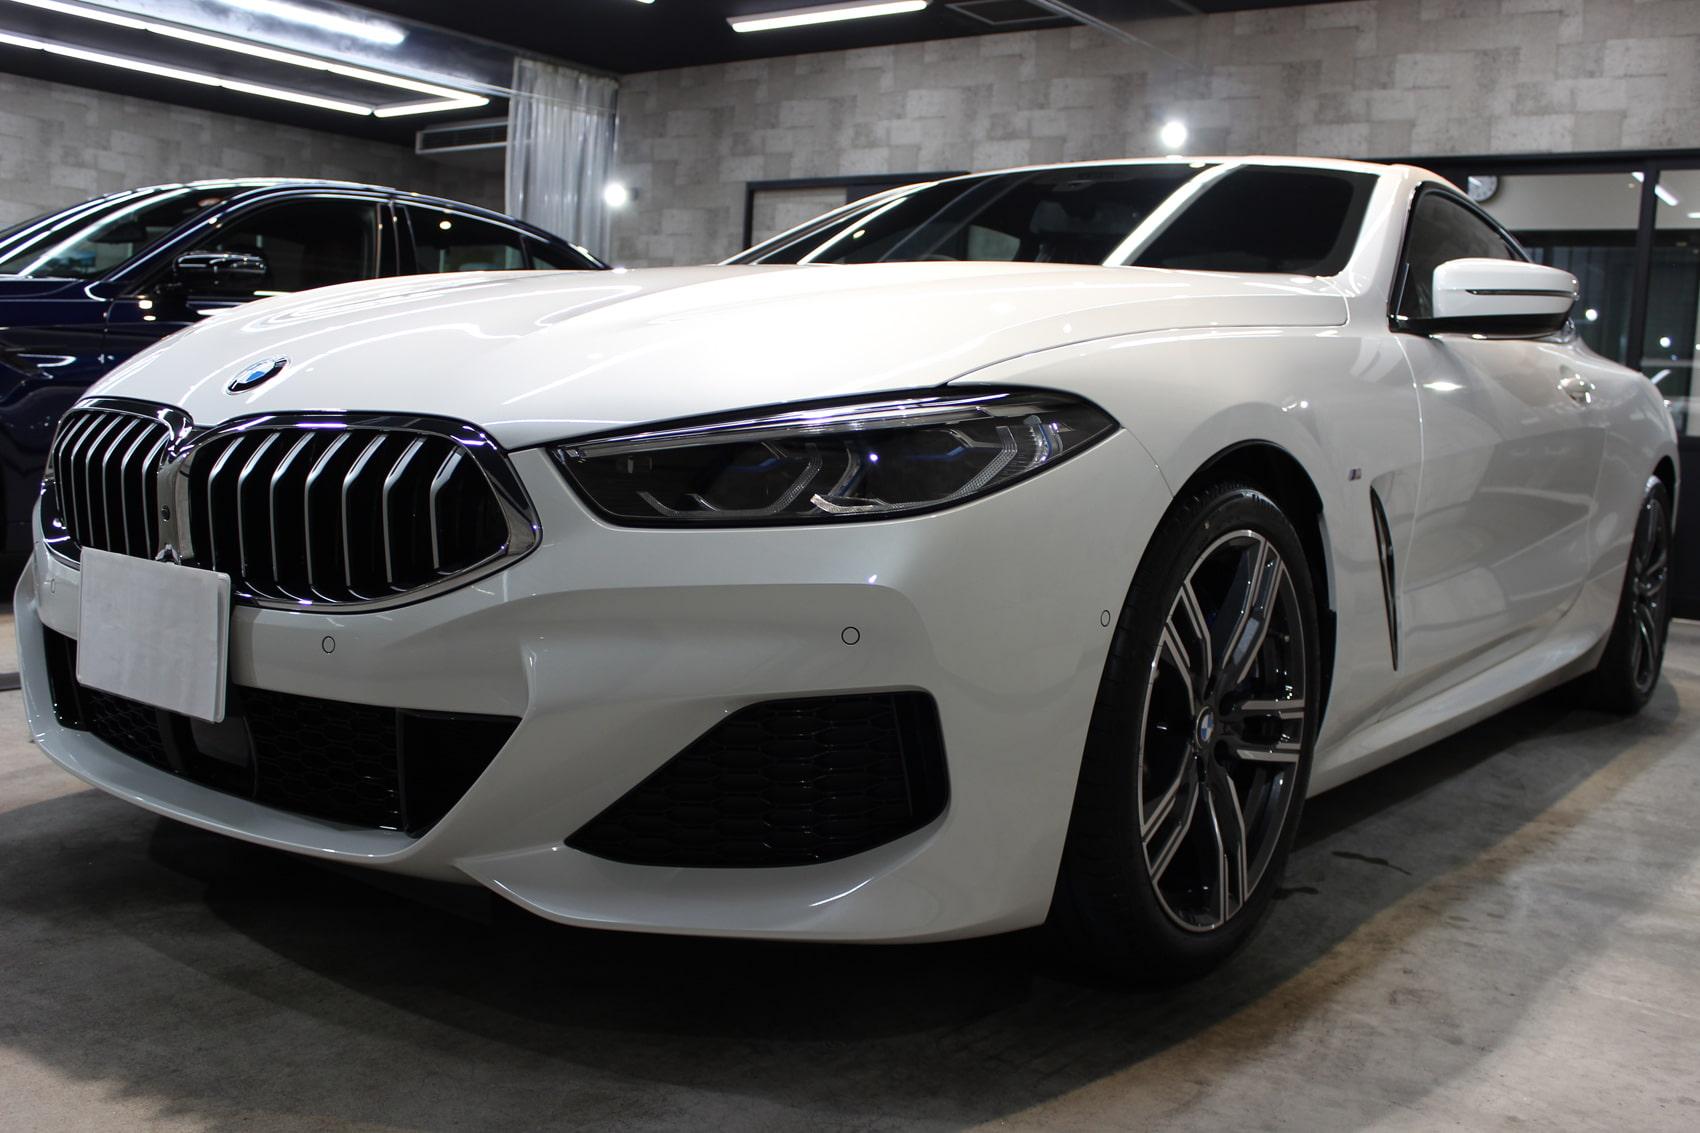 BMW 840iクーペ ミネラルホワイト フロントバンパー左